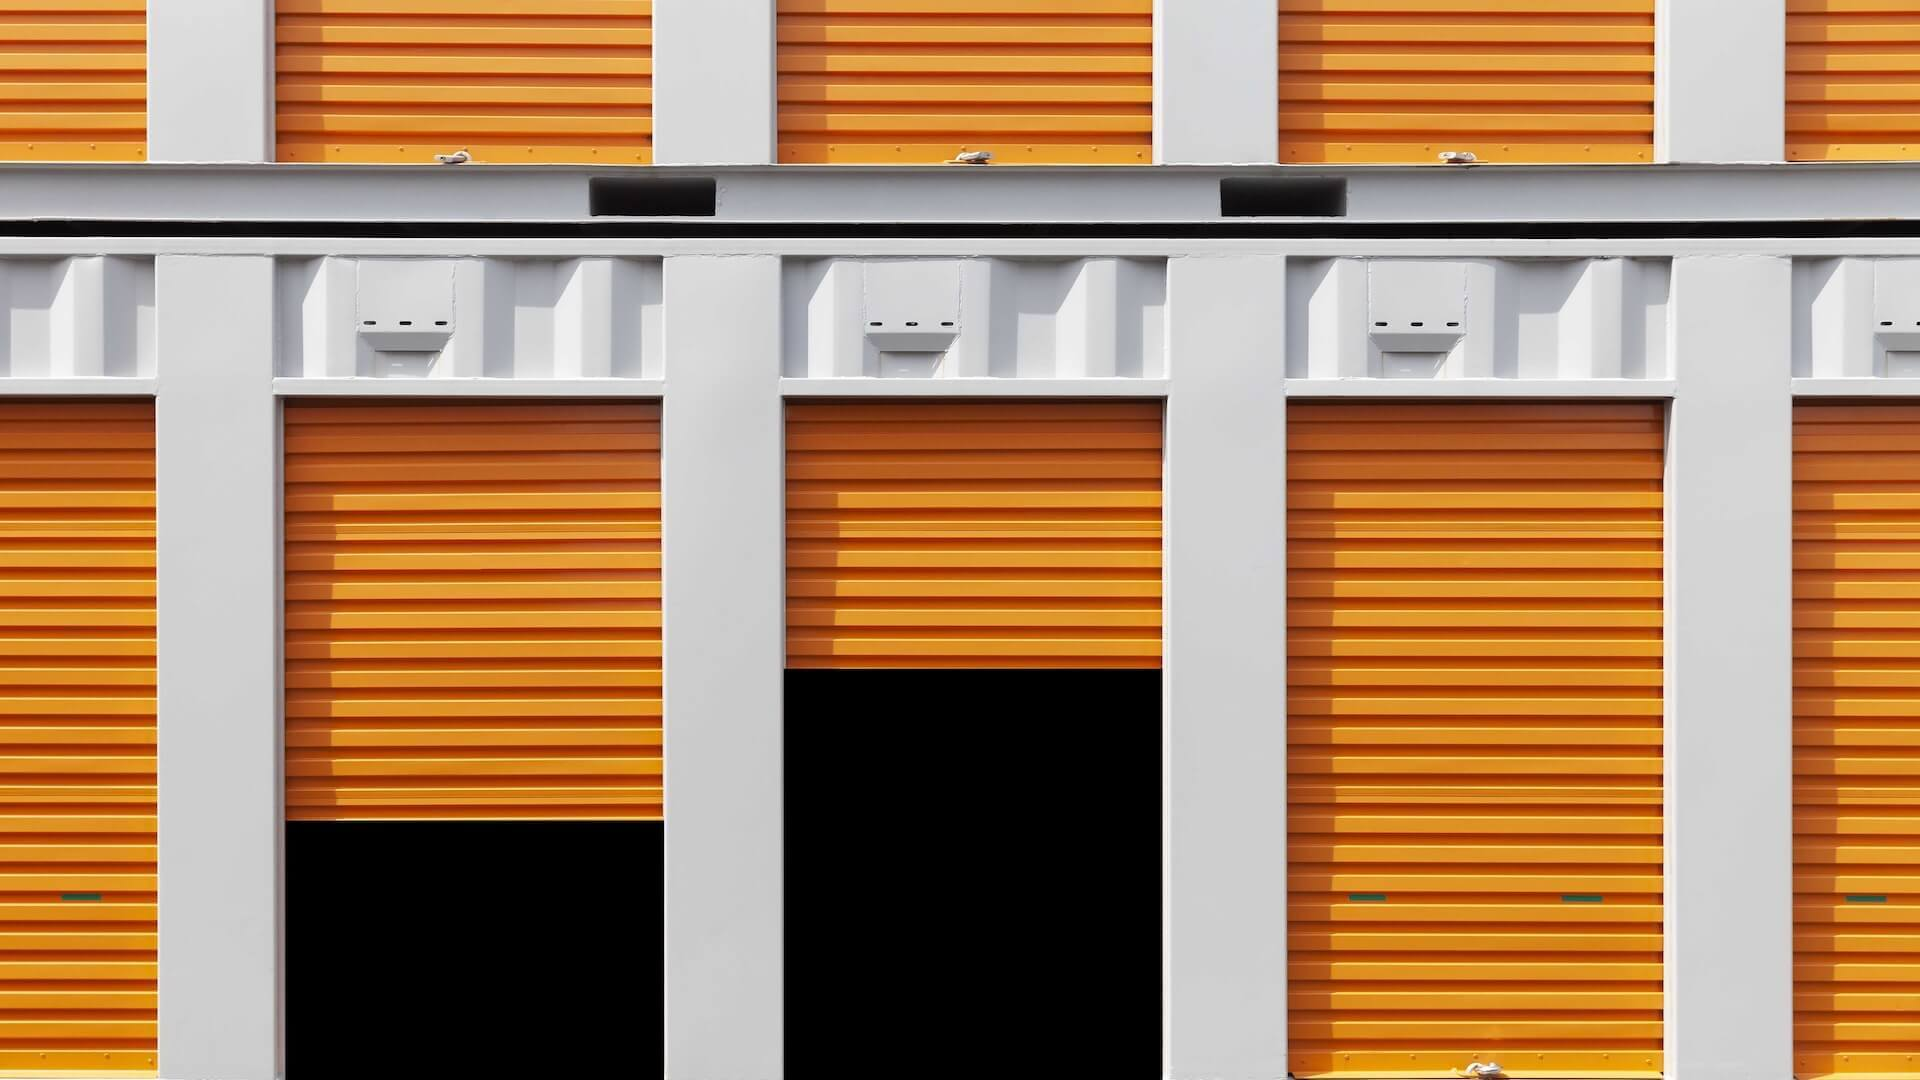 Self-Storage Units in a row